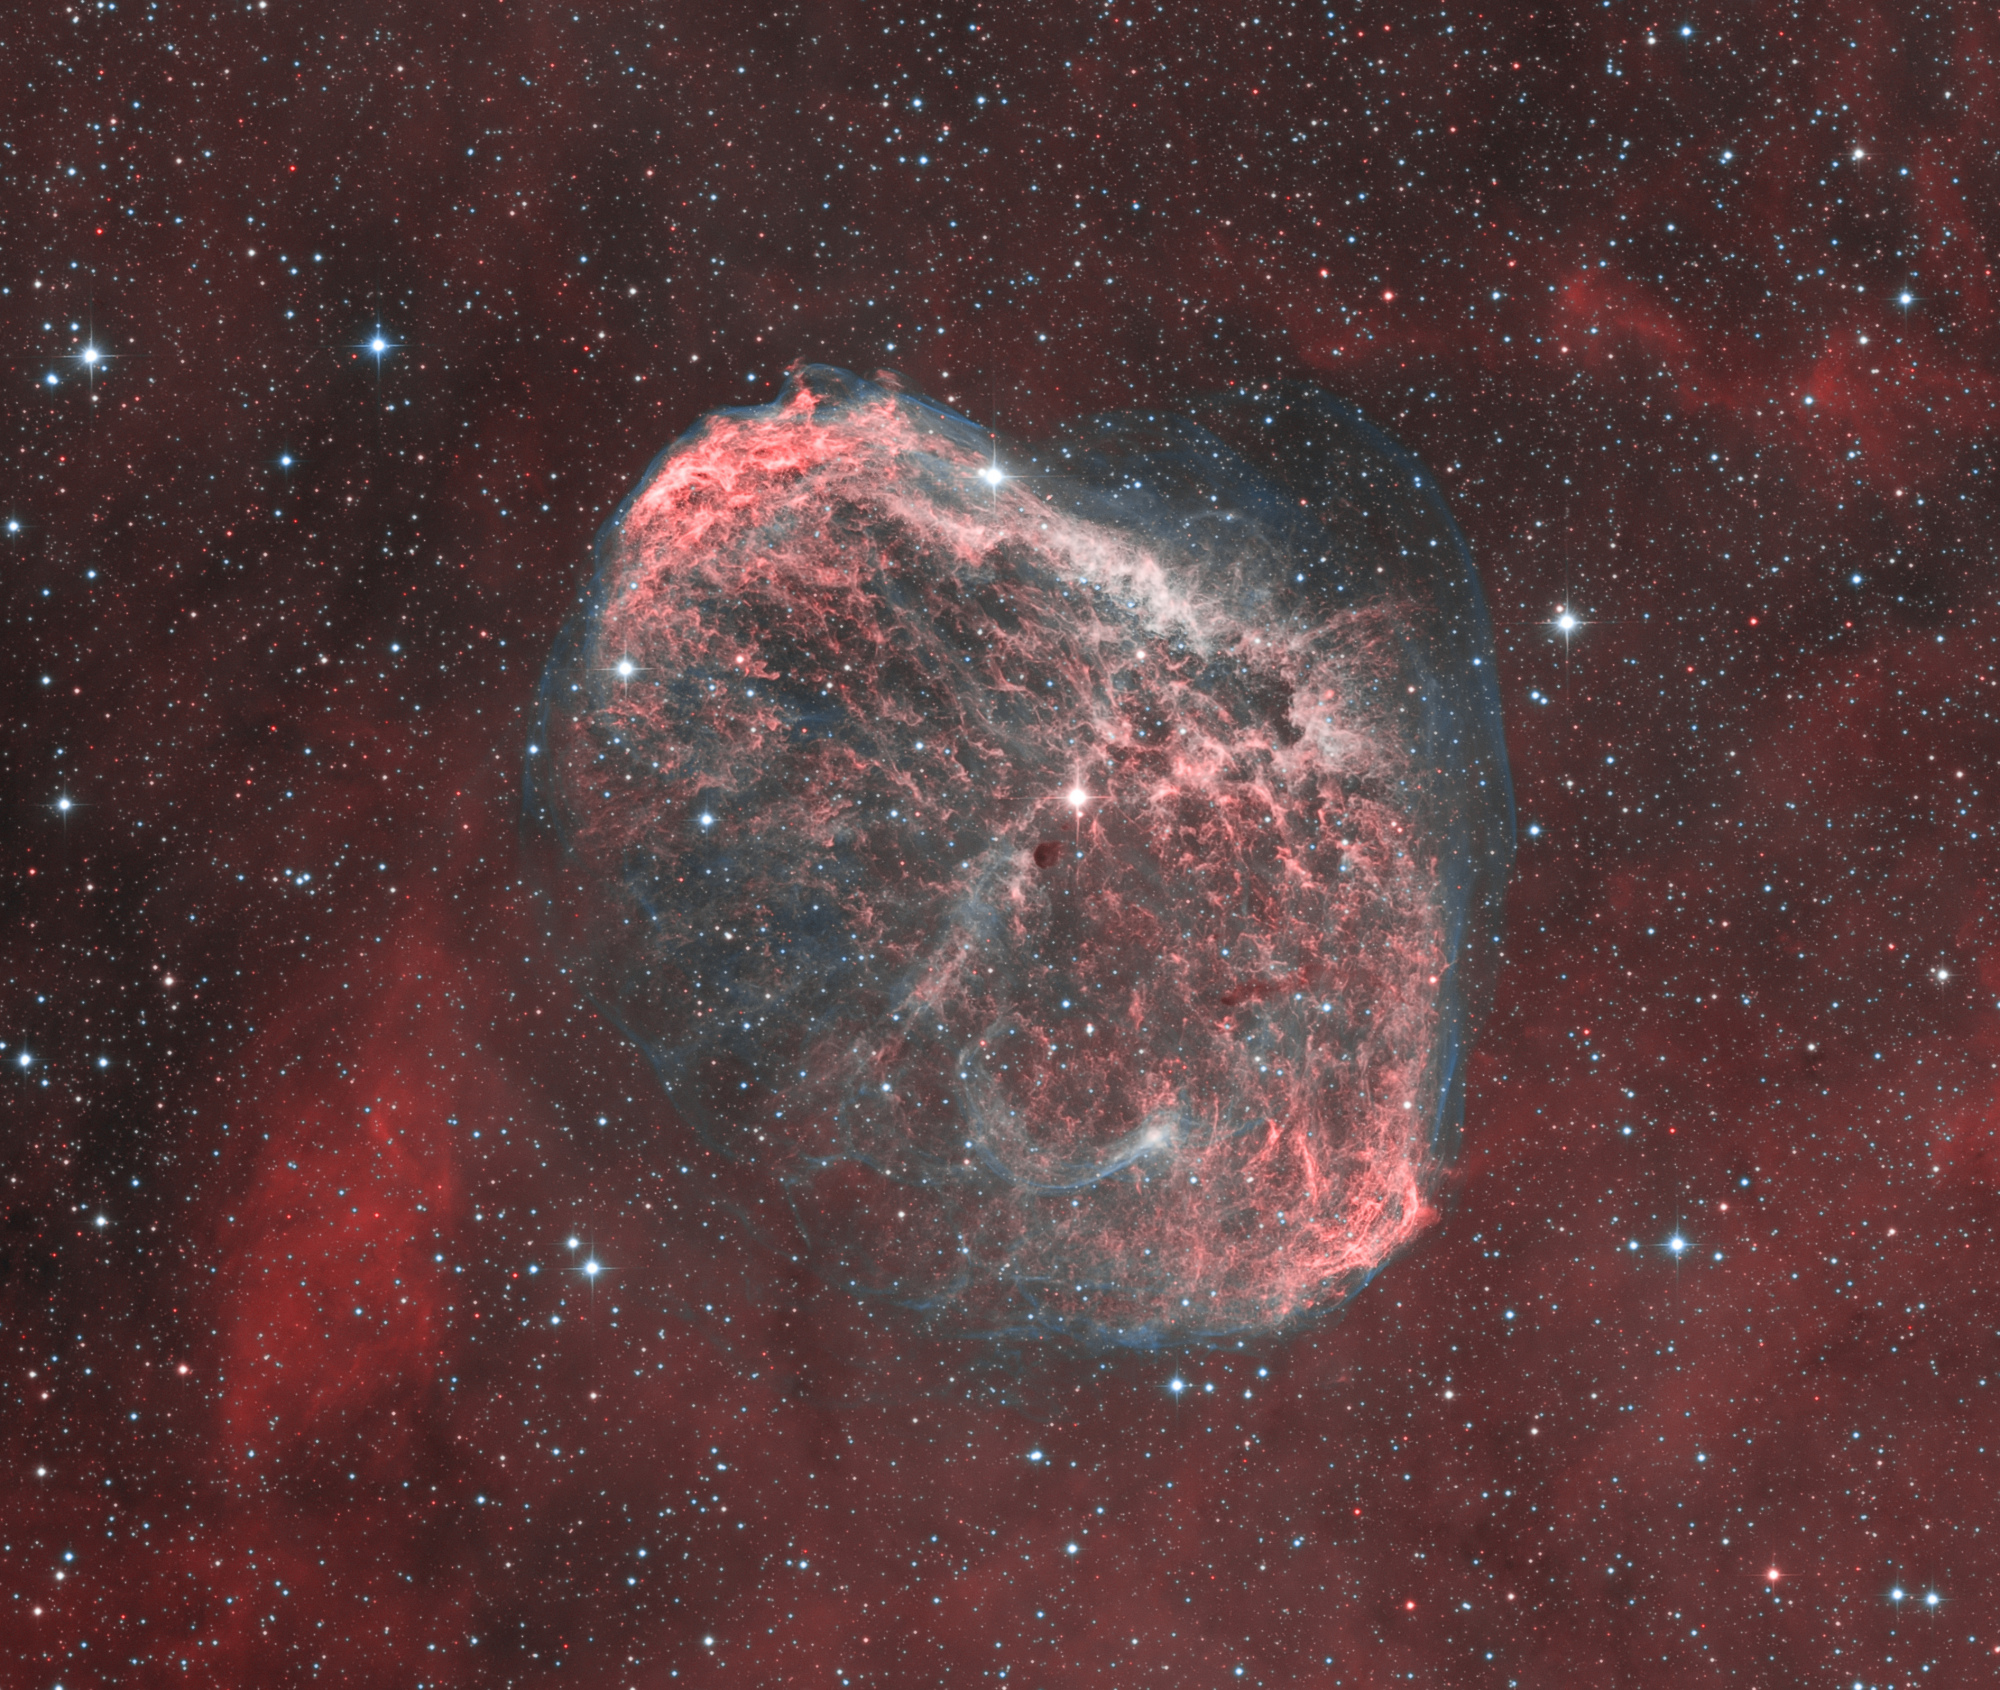 NGC6888HOI-HOO-V2-Crop.thumb.jpg.27e2bd21bf0e2a90d7ac25b5efcdea13.jpg